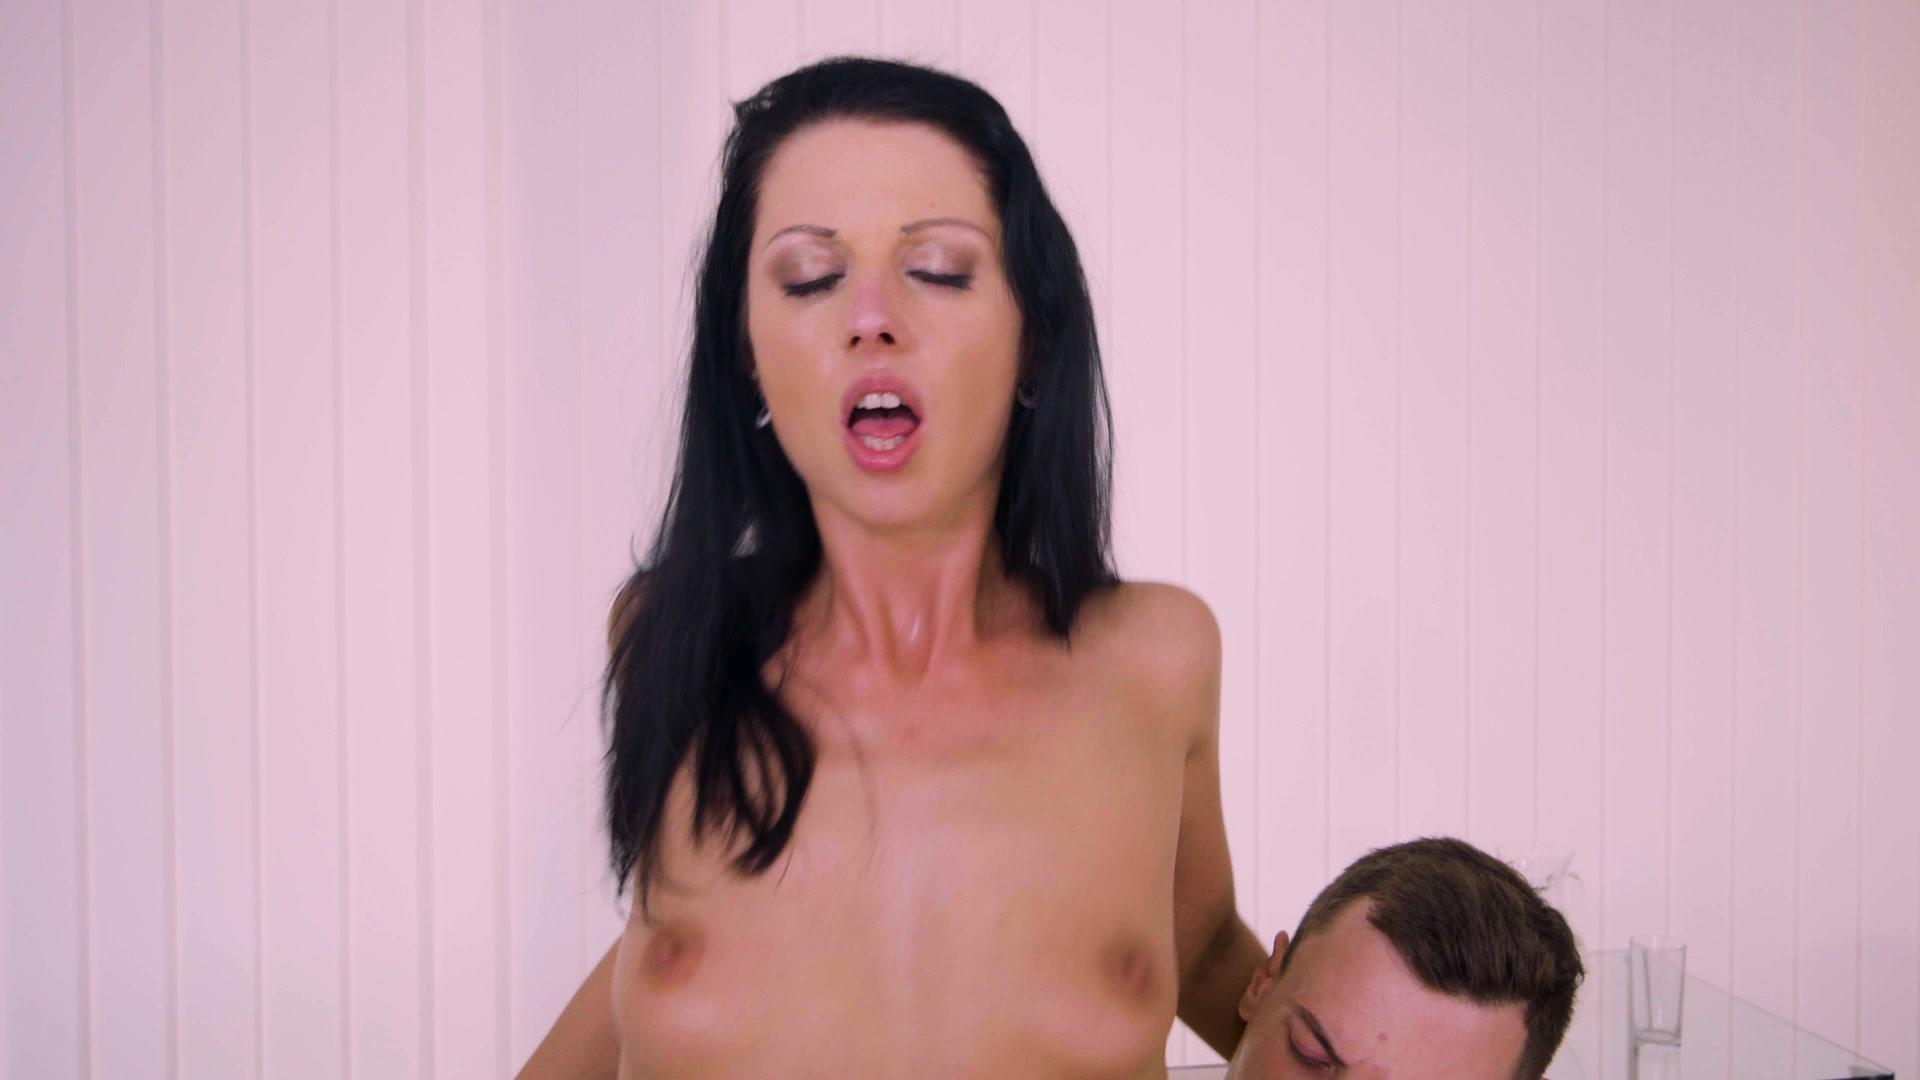 Love a milf video preview hot Wanna her